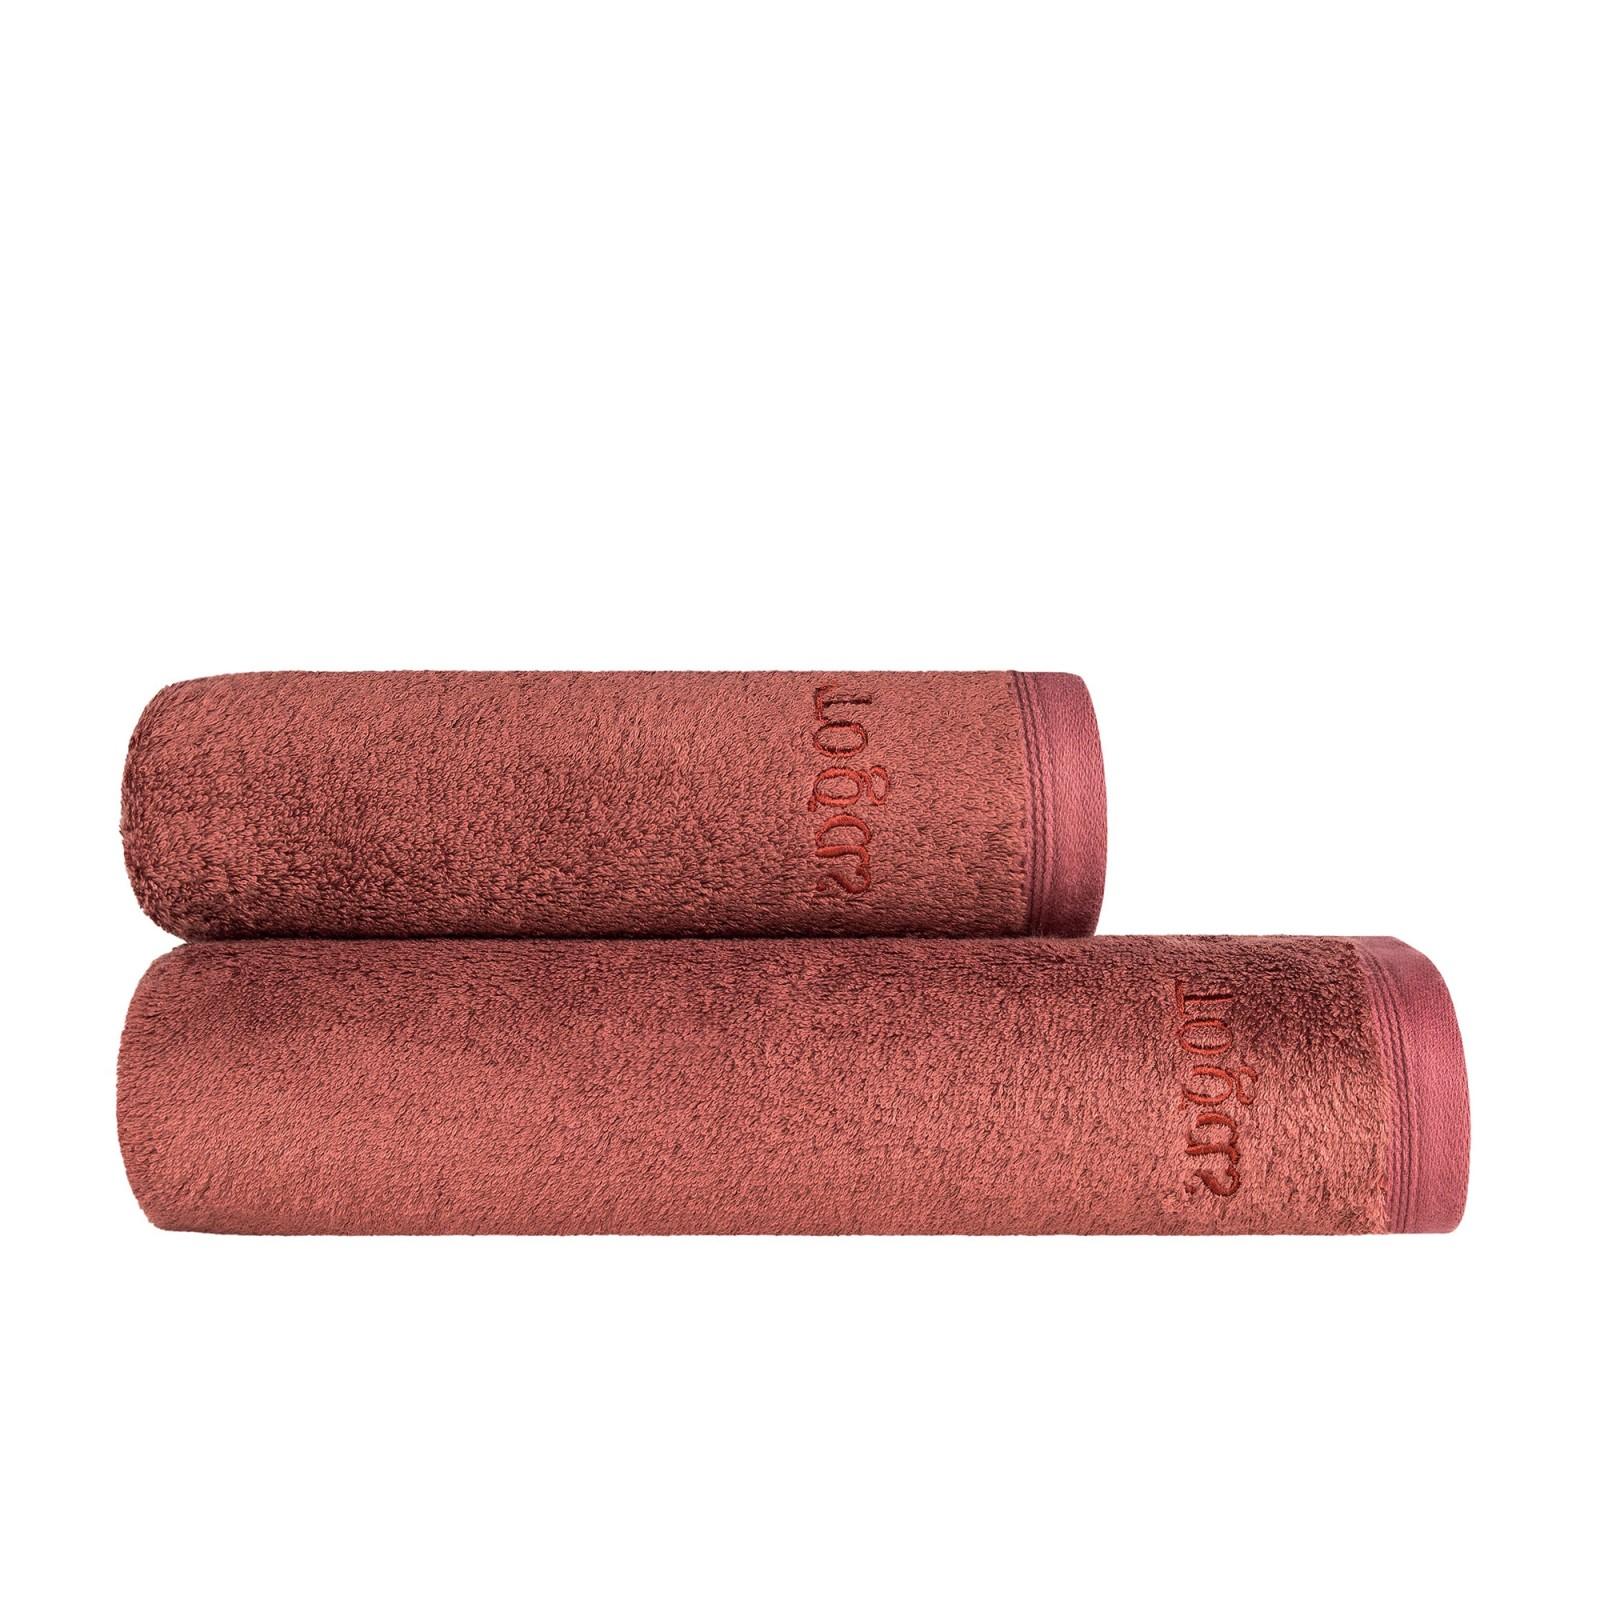 Полотенца Togas Полотенце Пуатье Цвет: Марсала (70х140 см)